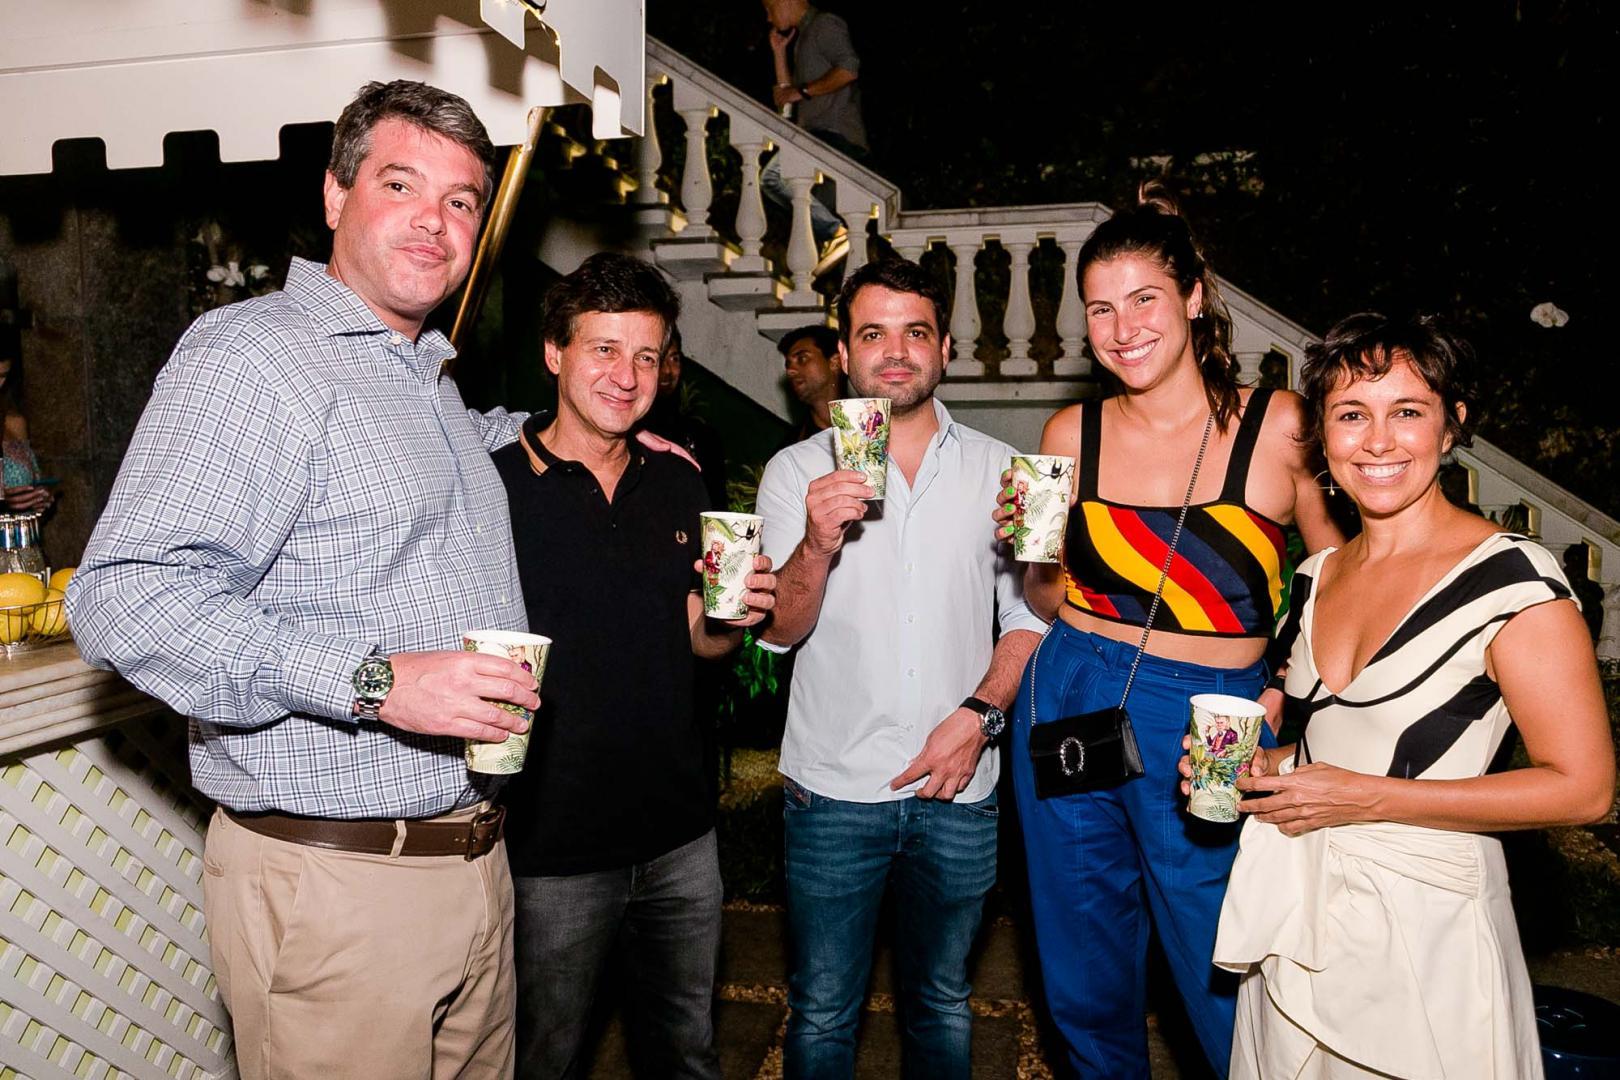 Festa de lançamento do Gin Monkey47 agita o Jardim Pernambuco